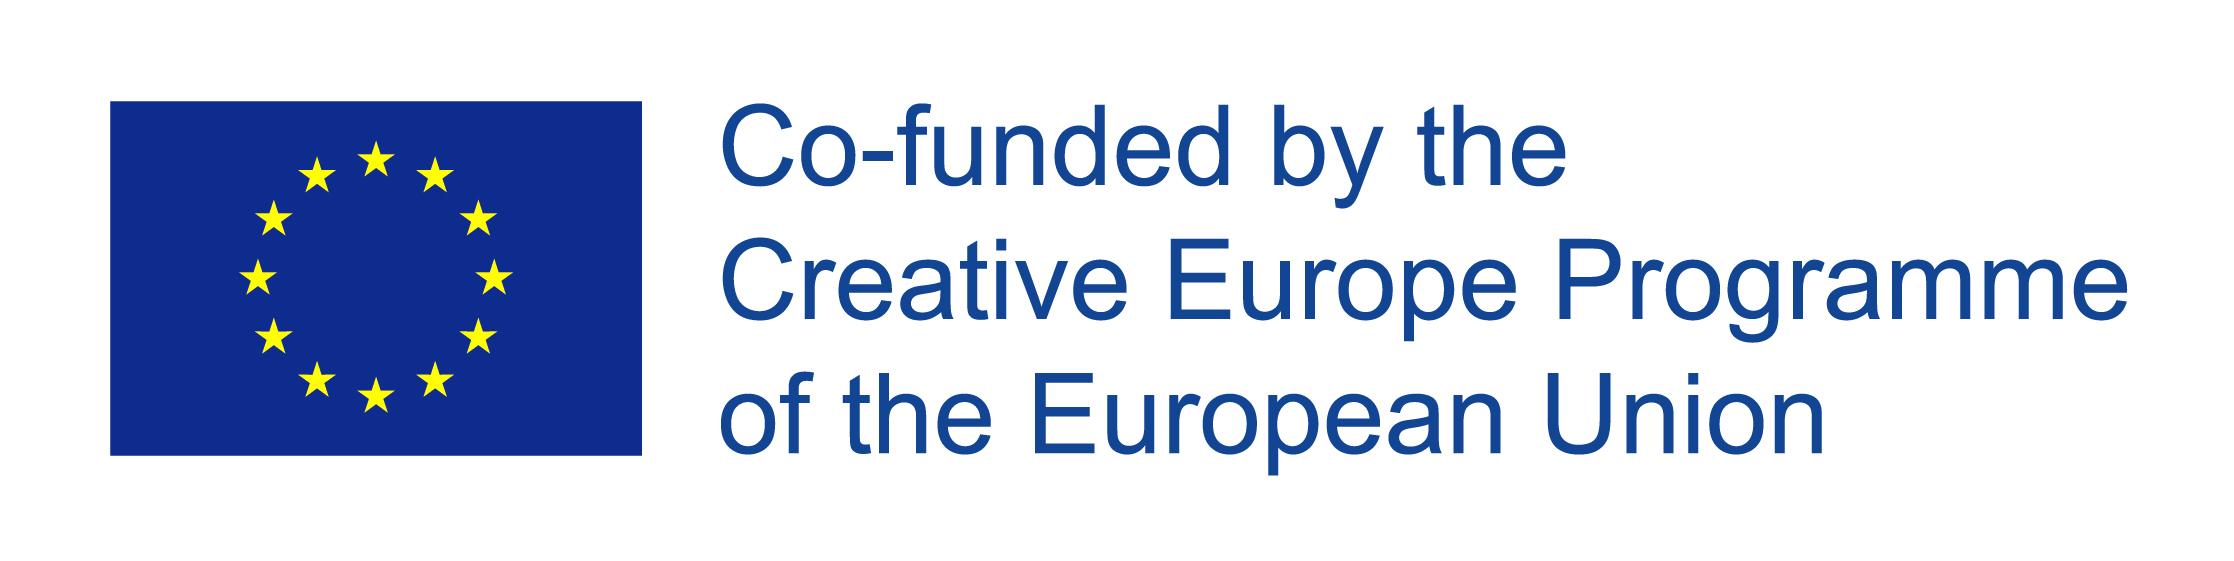 eu_flag_creative_europe_co_funded_pos_[rgb]_right.jpg